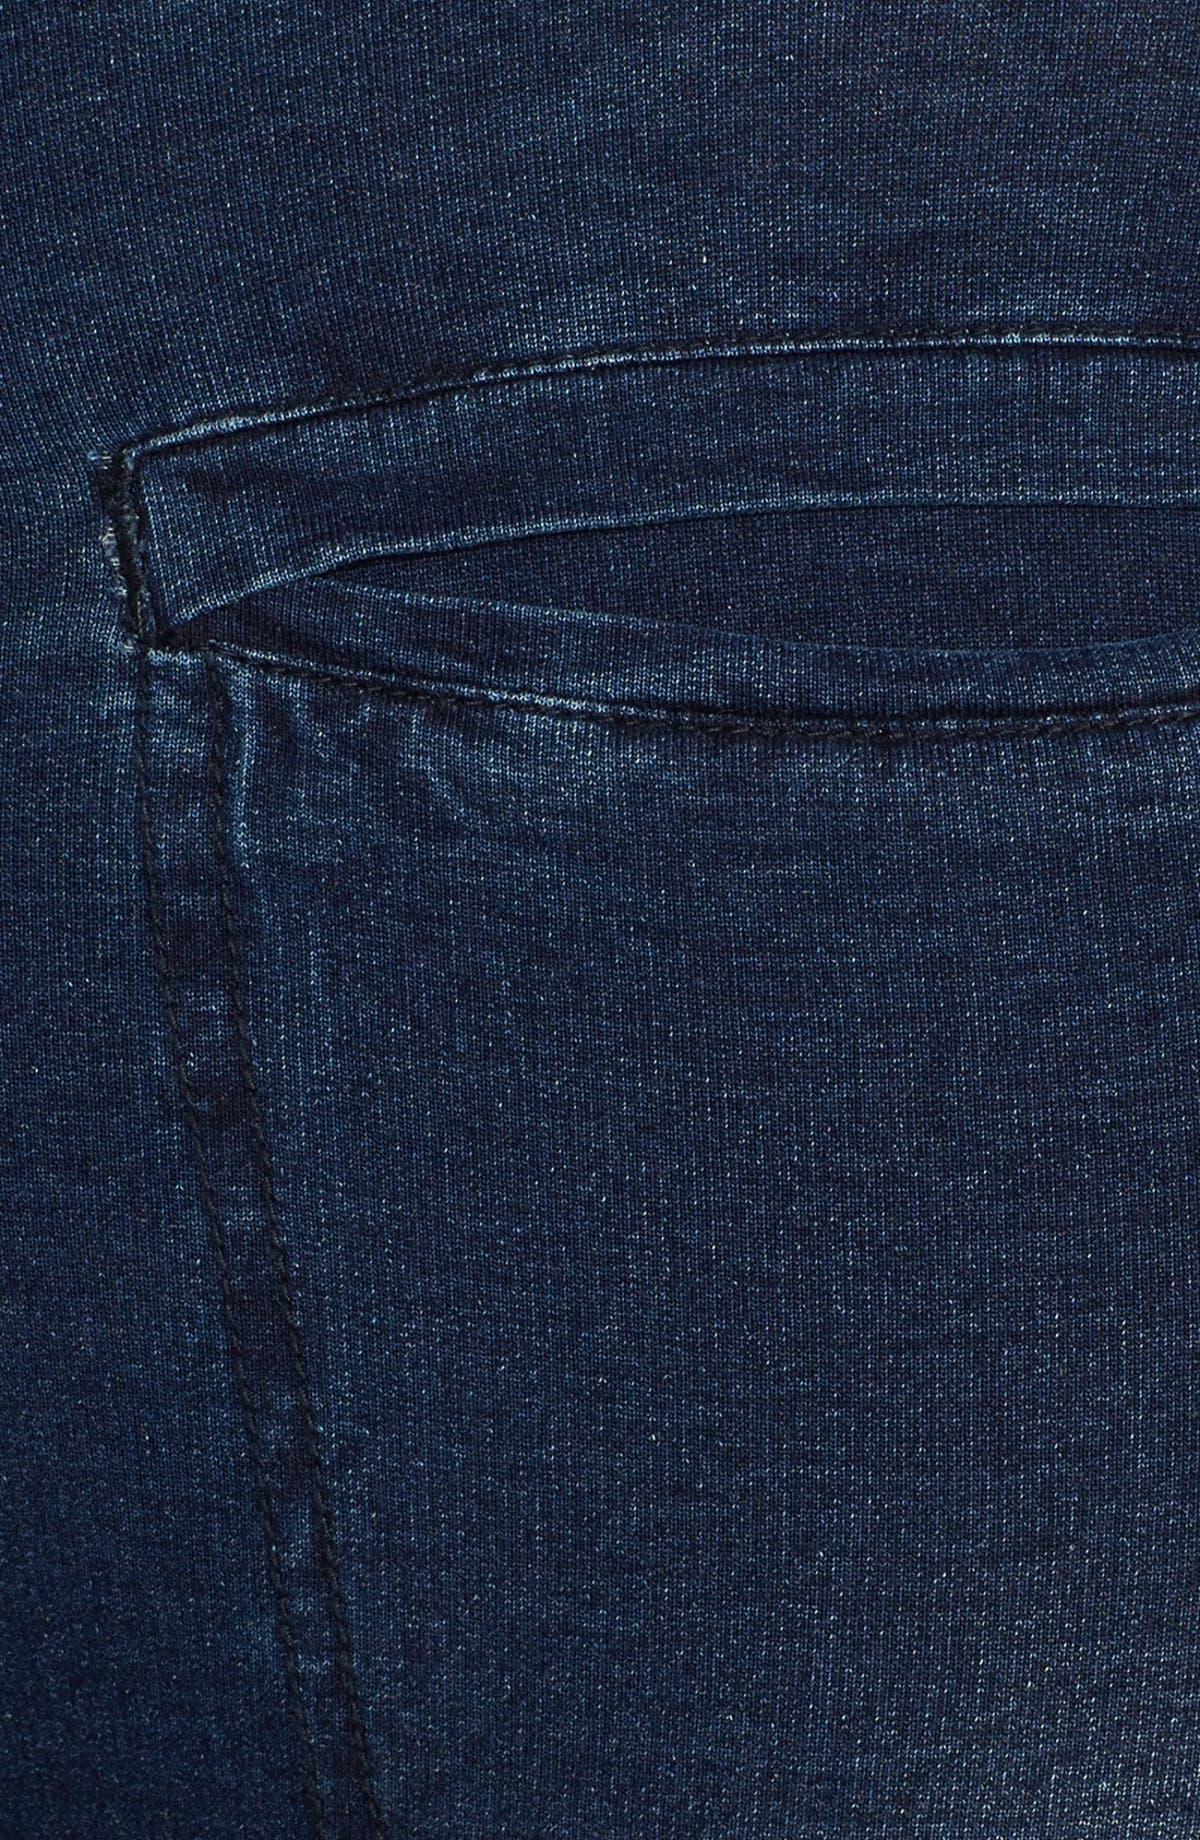 cccf8641677 Poetic Justice  Jonjon  Stretch Knit Denim Jogger Pants (Plus Size ...